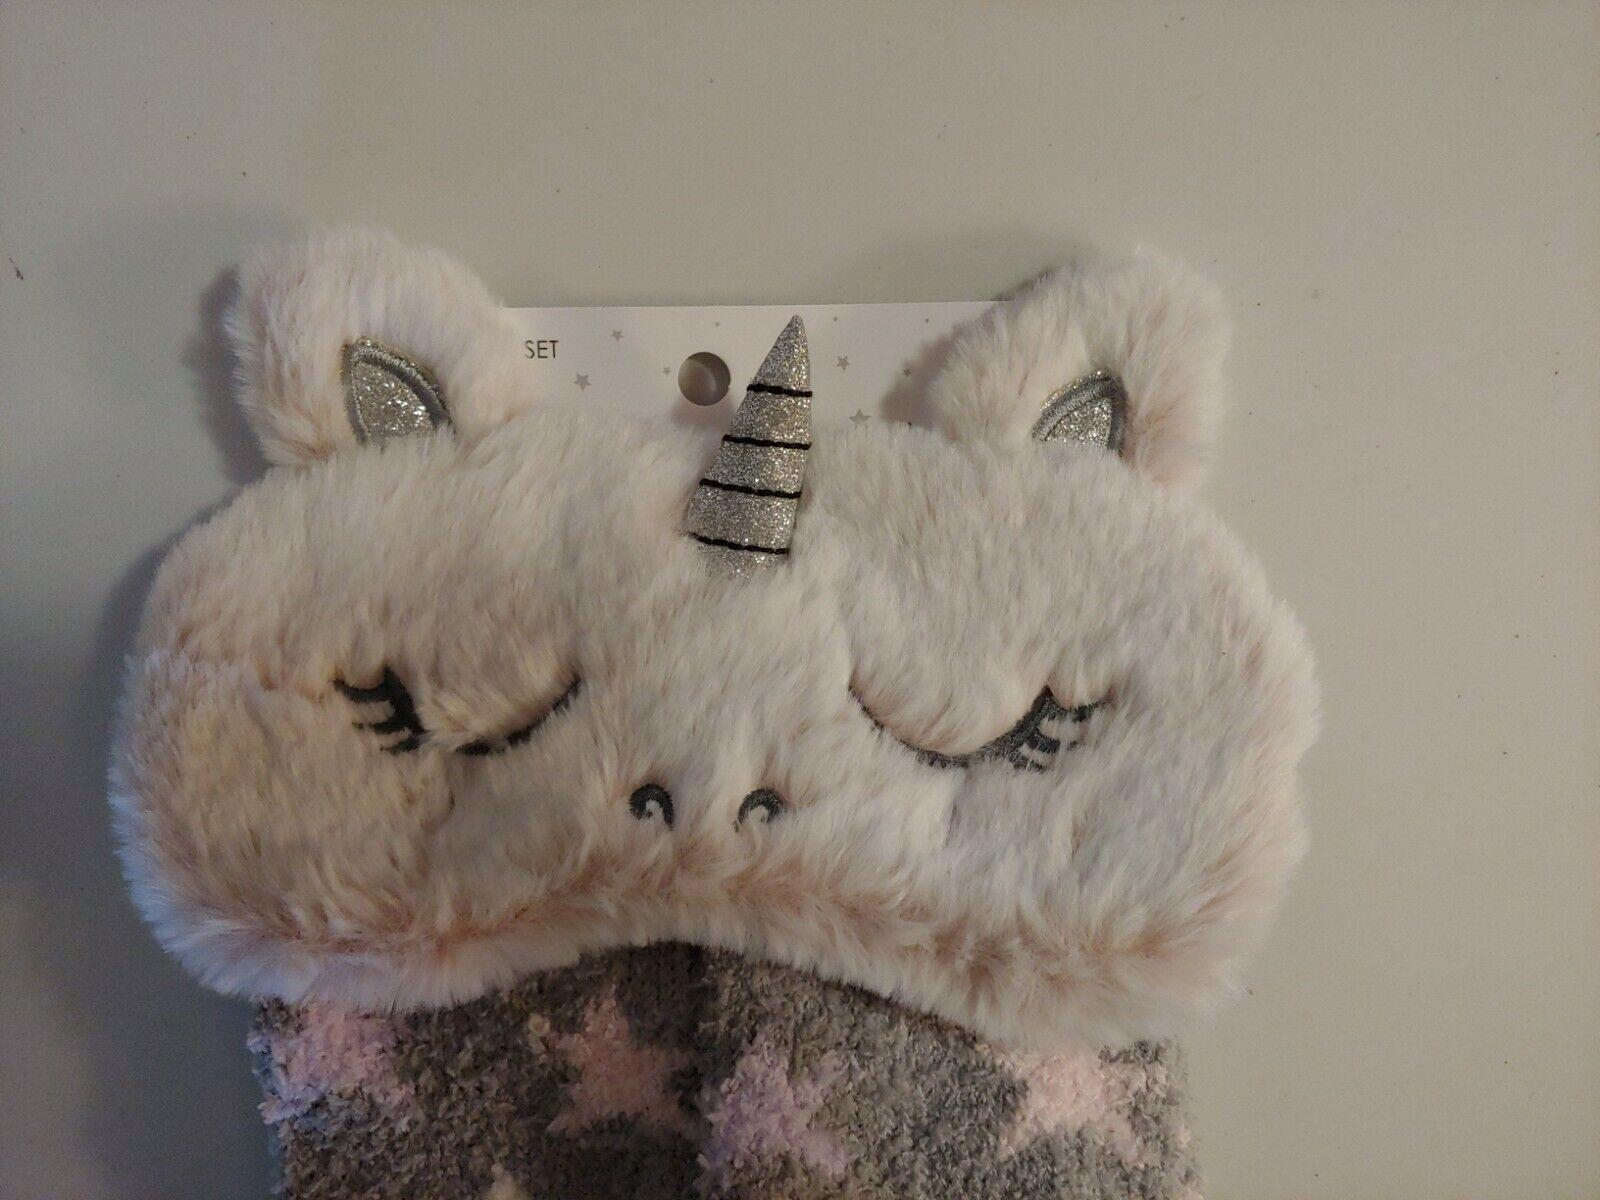 NWT UNICORN Eye Mask and Sock Set Cozy Women -2 Piece. B3